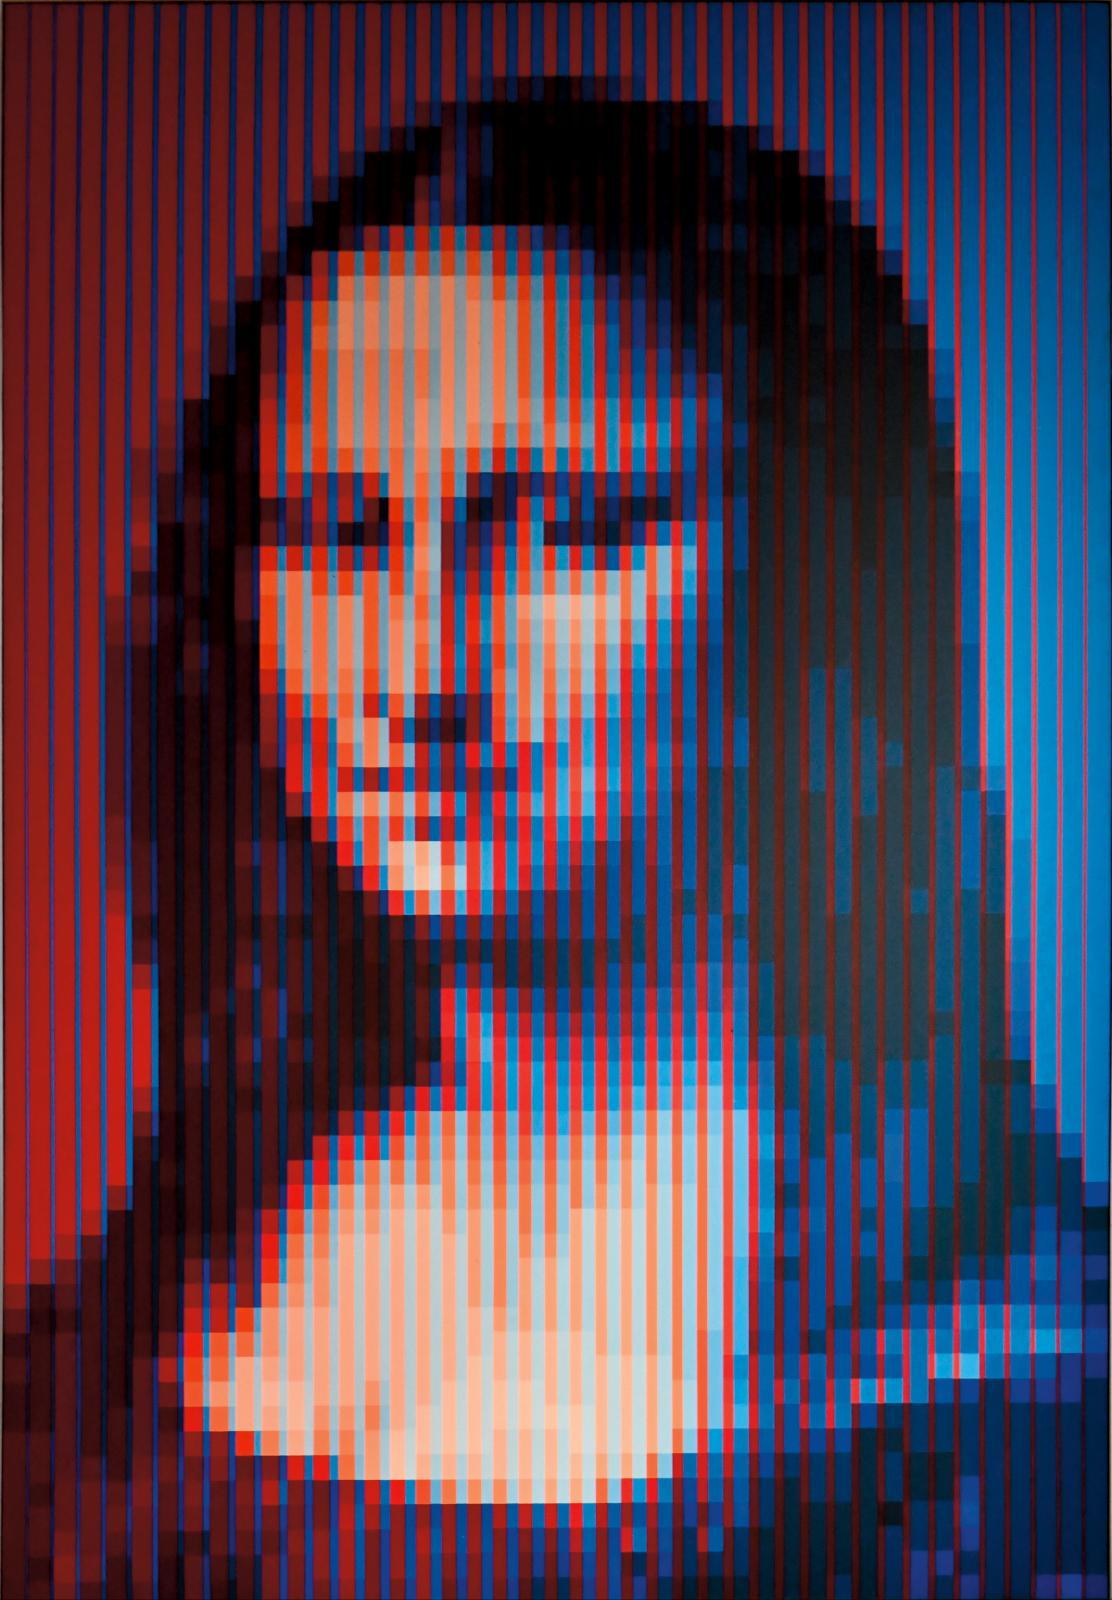 Yvaral (1934-2002), Mona Lisa Synthétique,toile, 1979, 196x130cm. Adjugé: 19200€